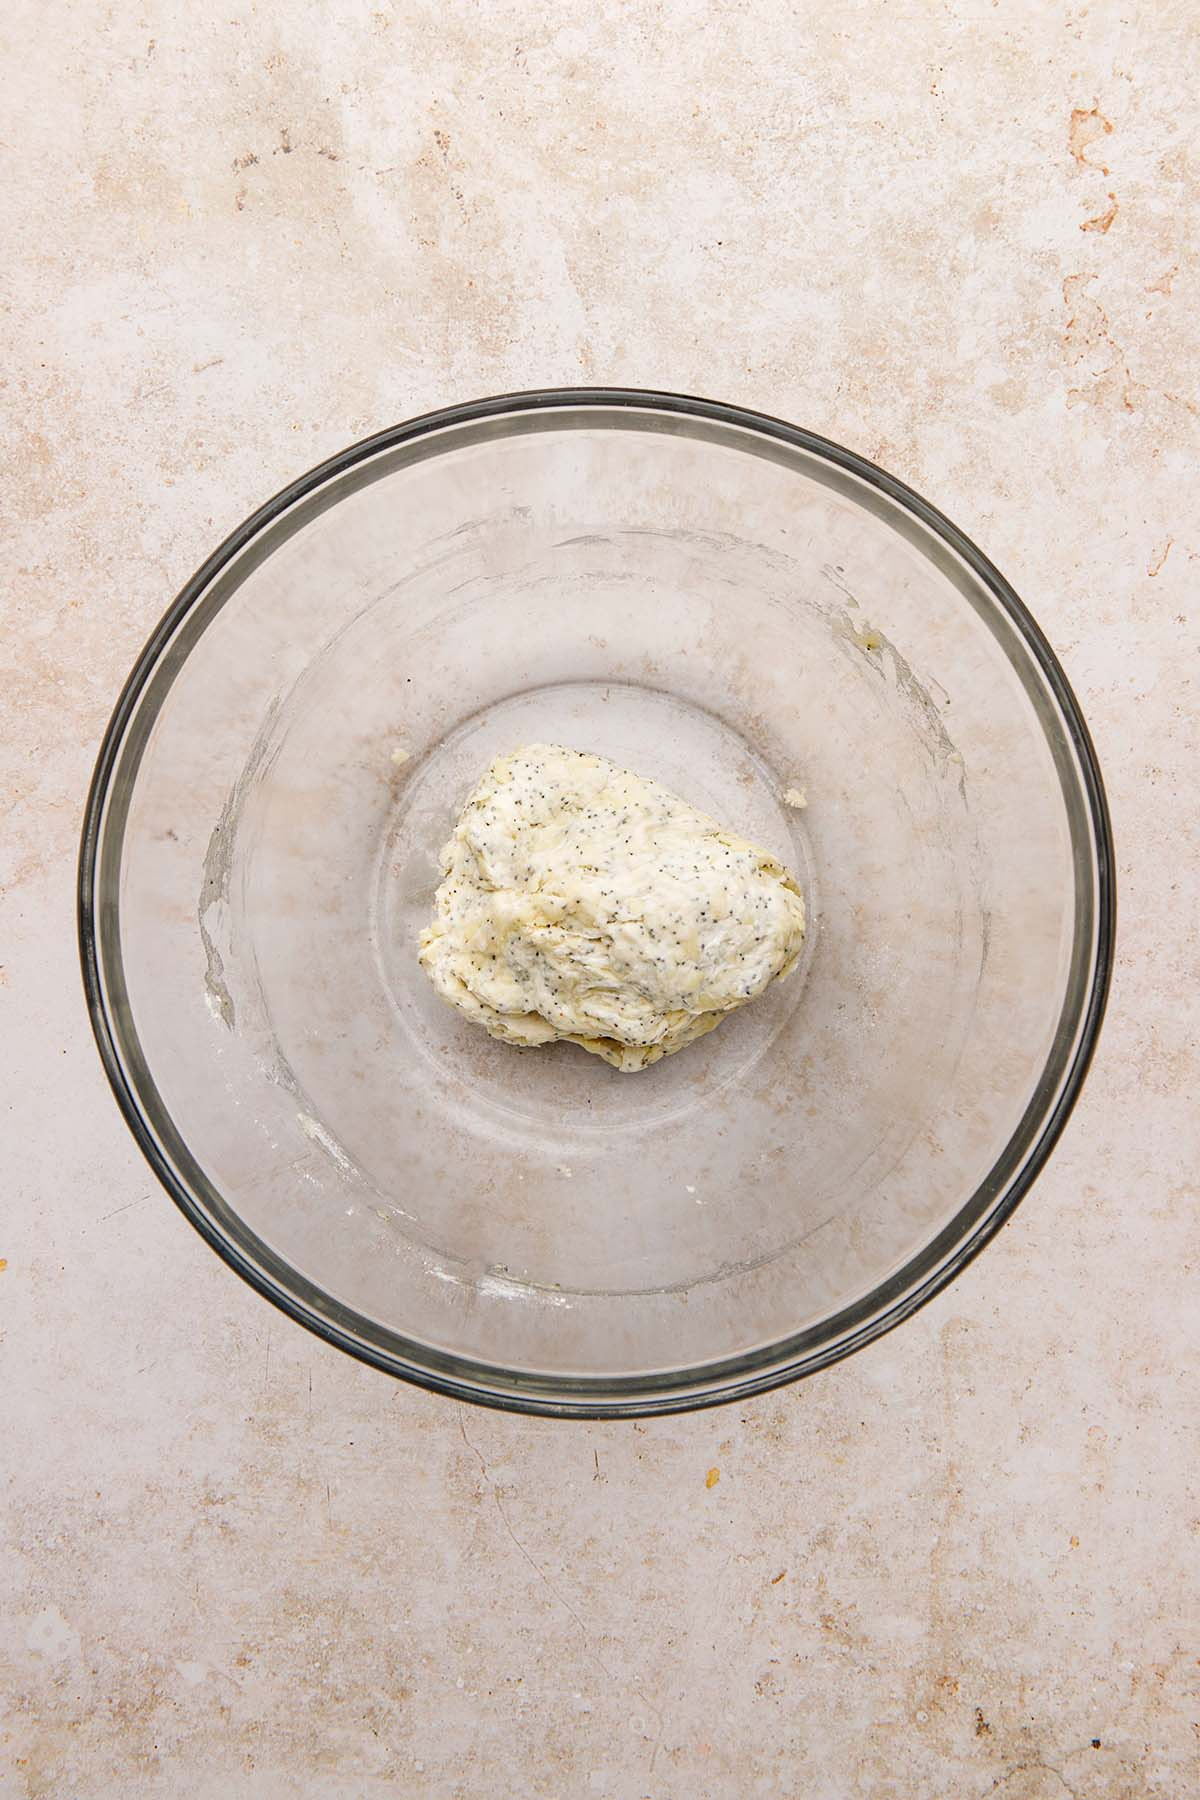 Dough in a glass bowl.